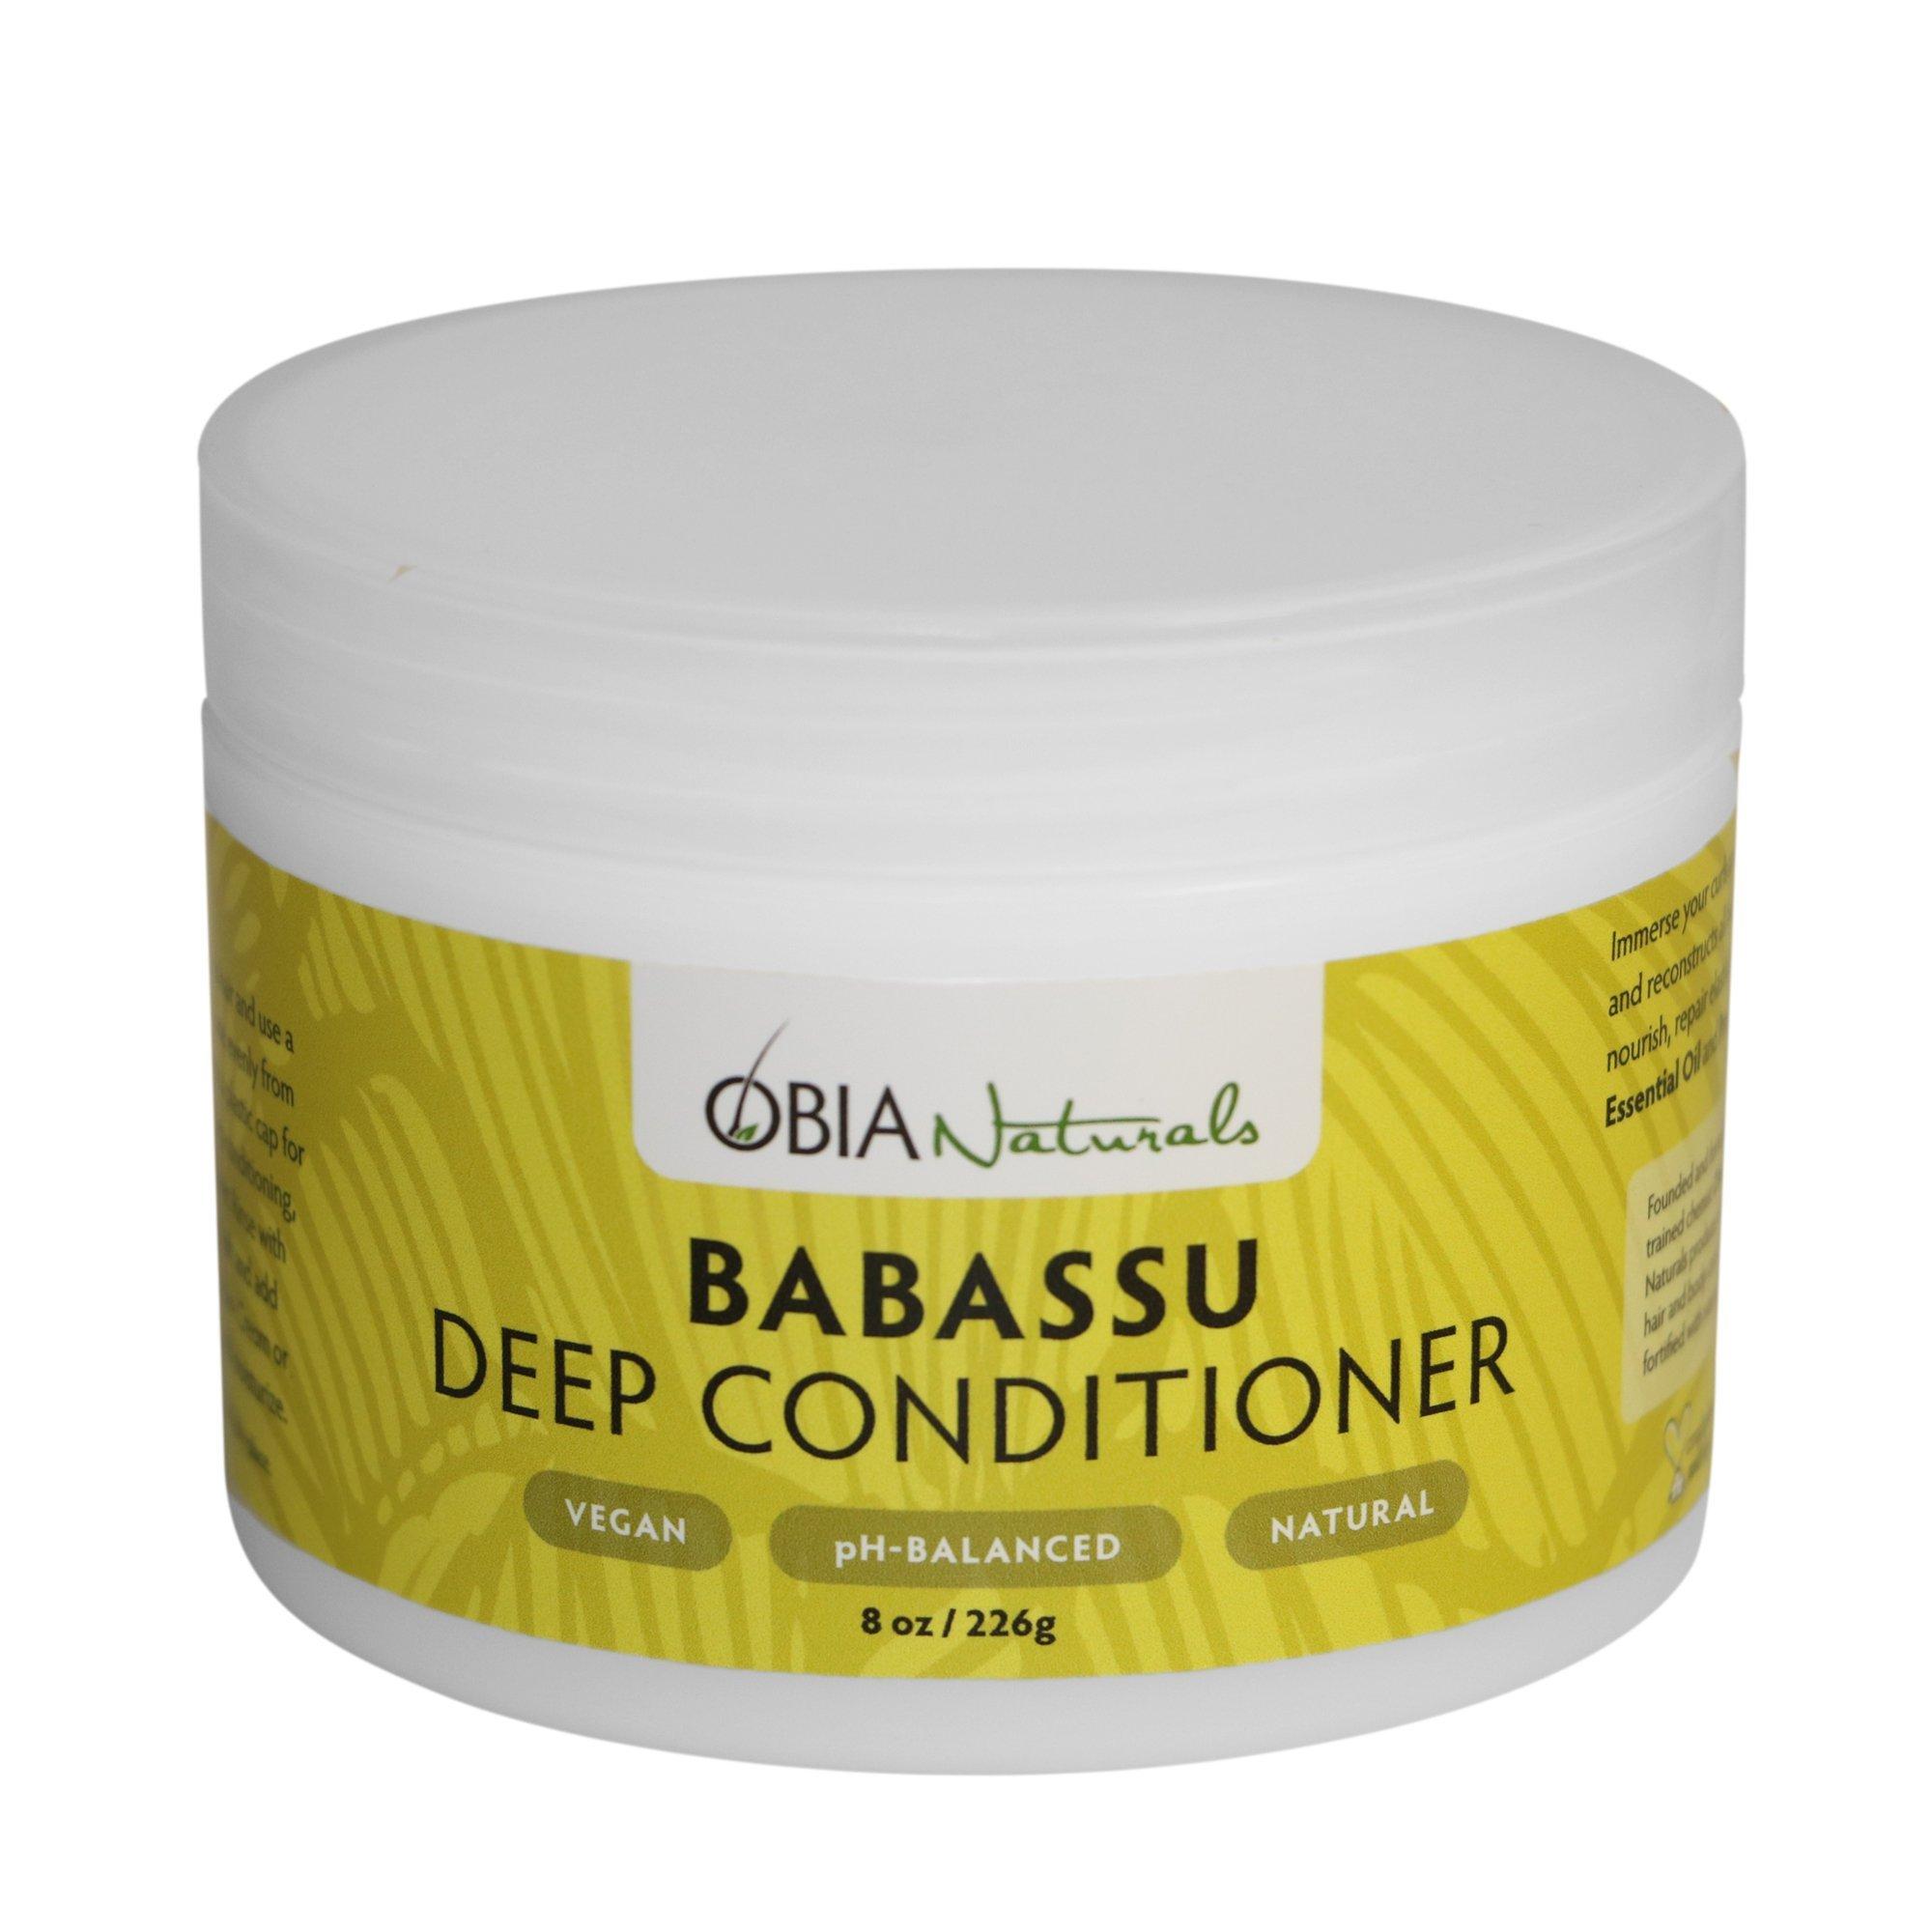 OBIA Naturals Babassu Deep Conditioner, 8 oz.